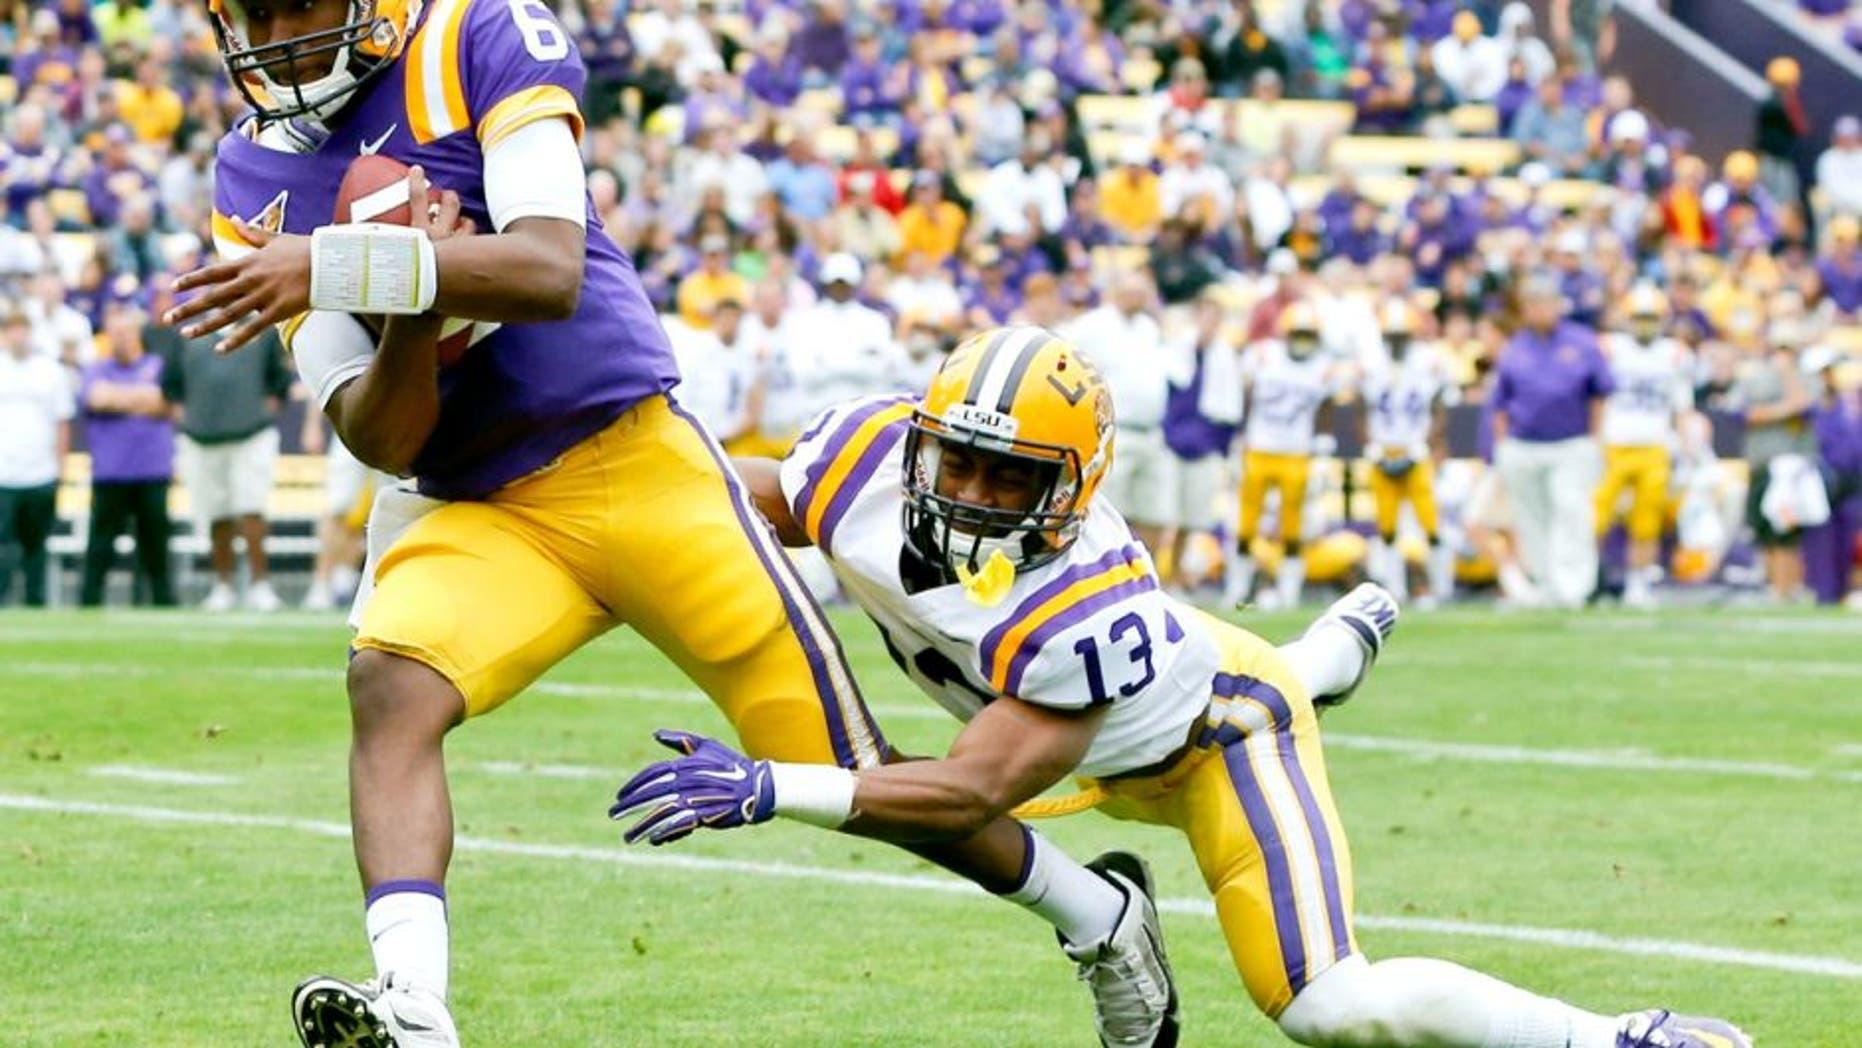 Apr 5, 2014; Baton Rouge, LA, USA; LSU Tigers quarterback Brandon Harris (6) runs for a touchdown past cornerback Dwayne Thomas (13) during the 2014 spring game at Tiger Stadium. Mandatory Credit: Derick E. Hingle-USA TODAY Sports